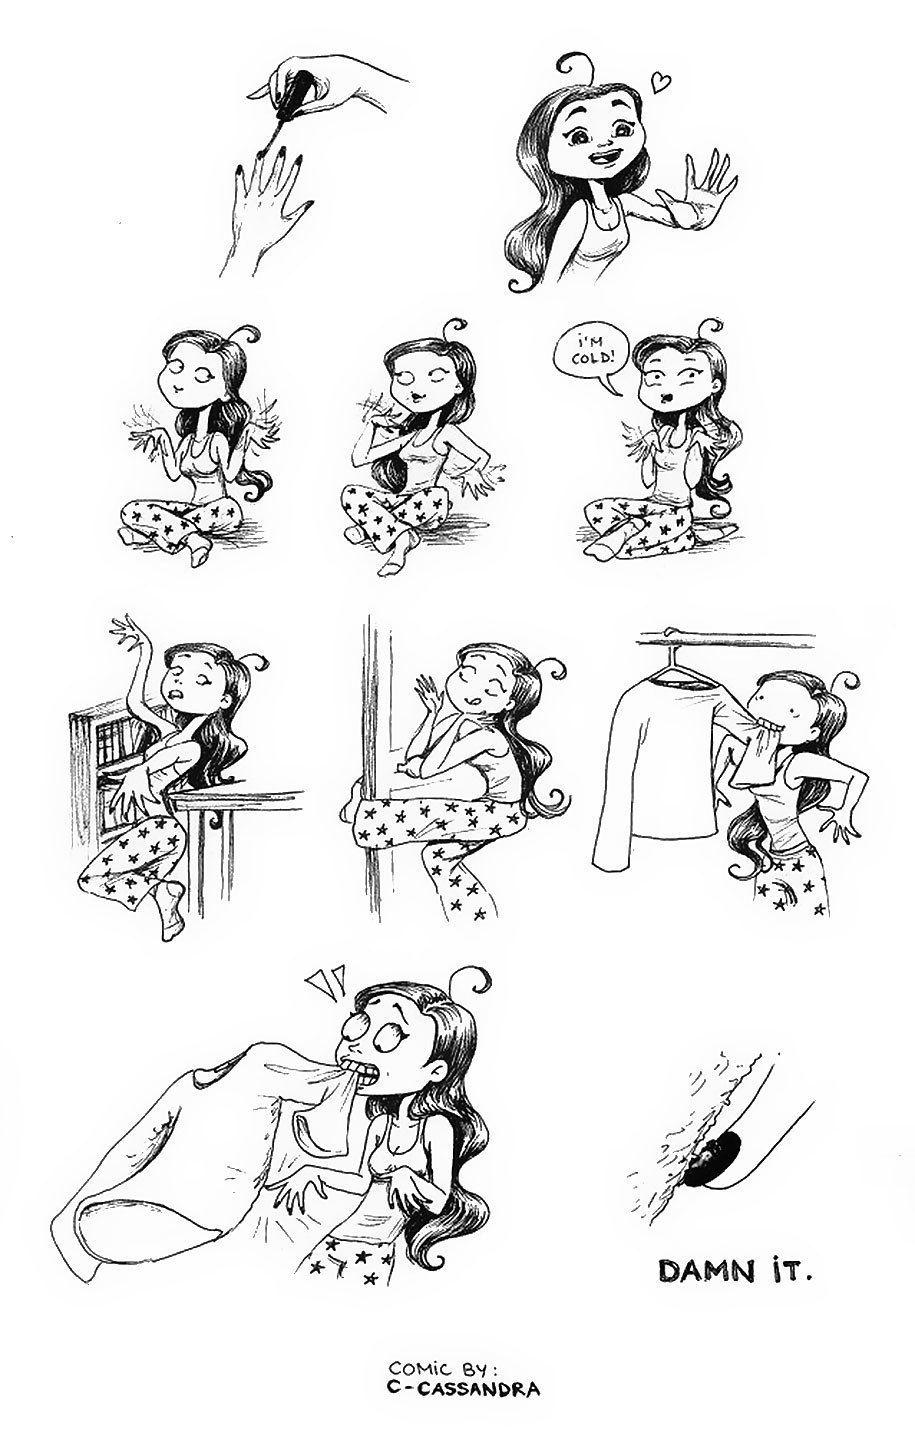 Women's Everyday Problems In 22 Hilariously Accurate Cartoons. - http://www.lifebuzz.com/cassandra-calin/